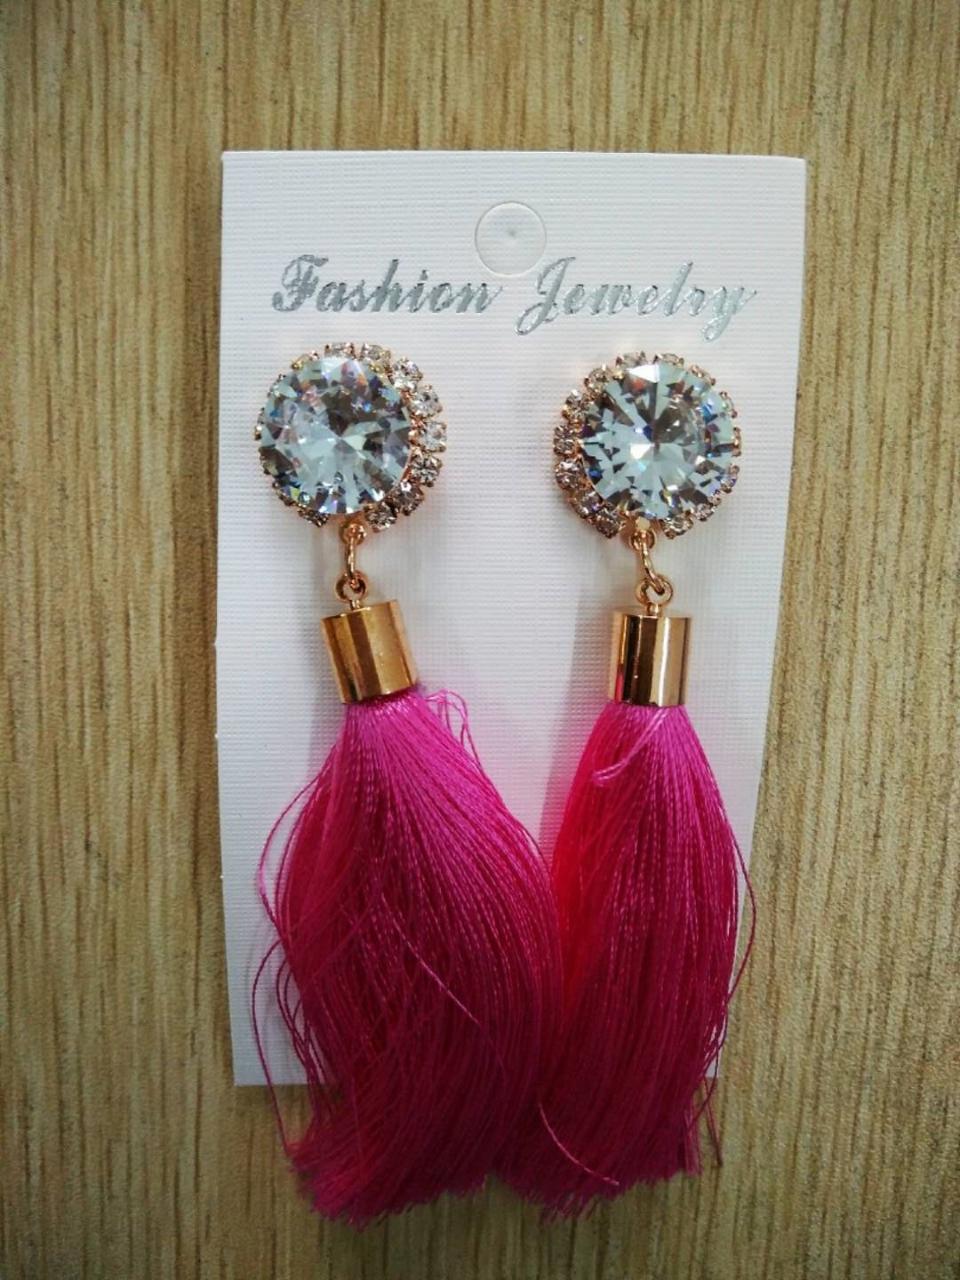 af5b8ca793b 2019 Rhinestone Vintage Fashion Dangle Earring Long Tassel Fringe ...